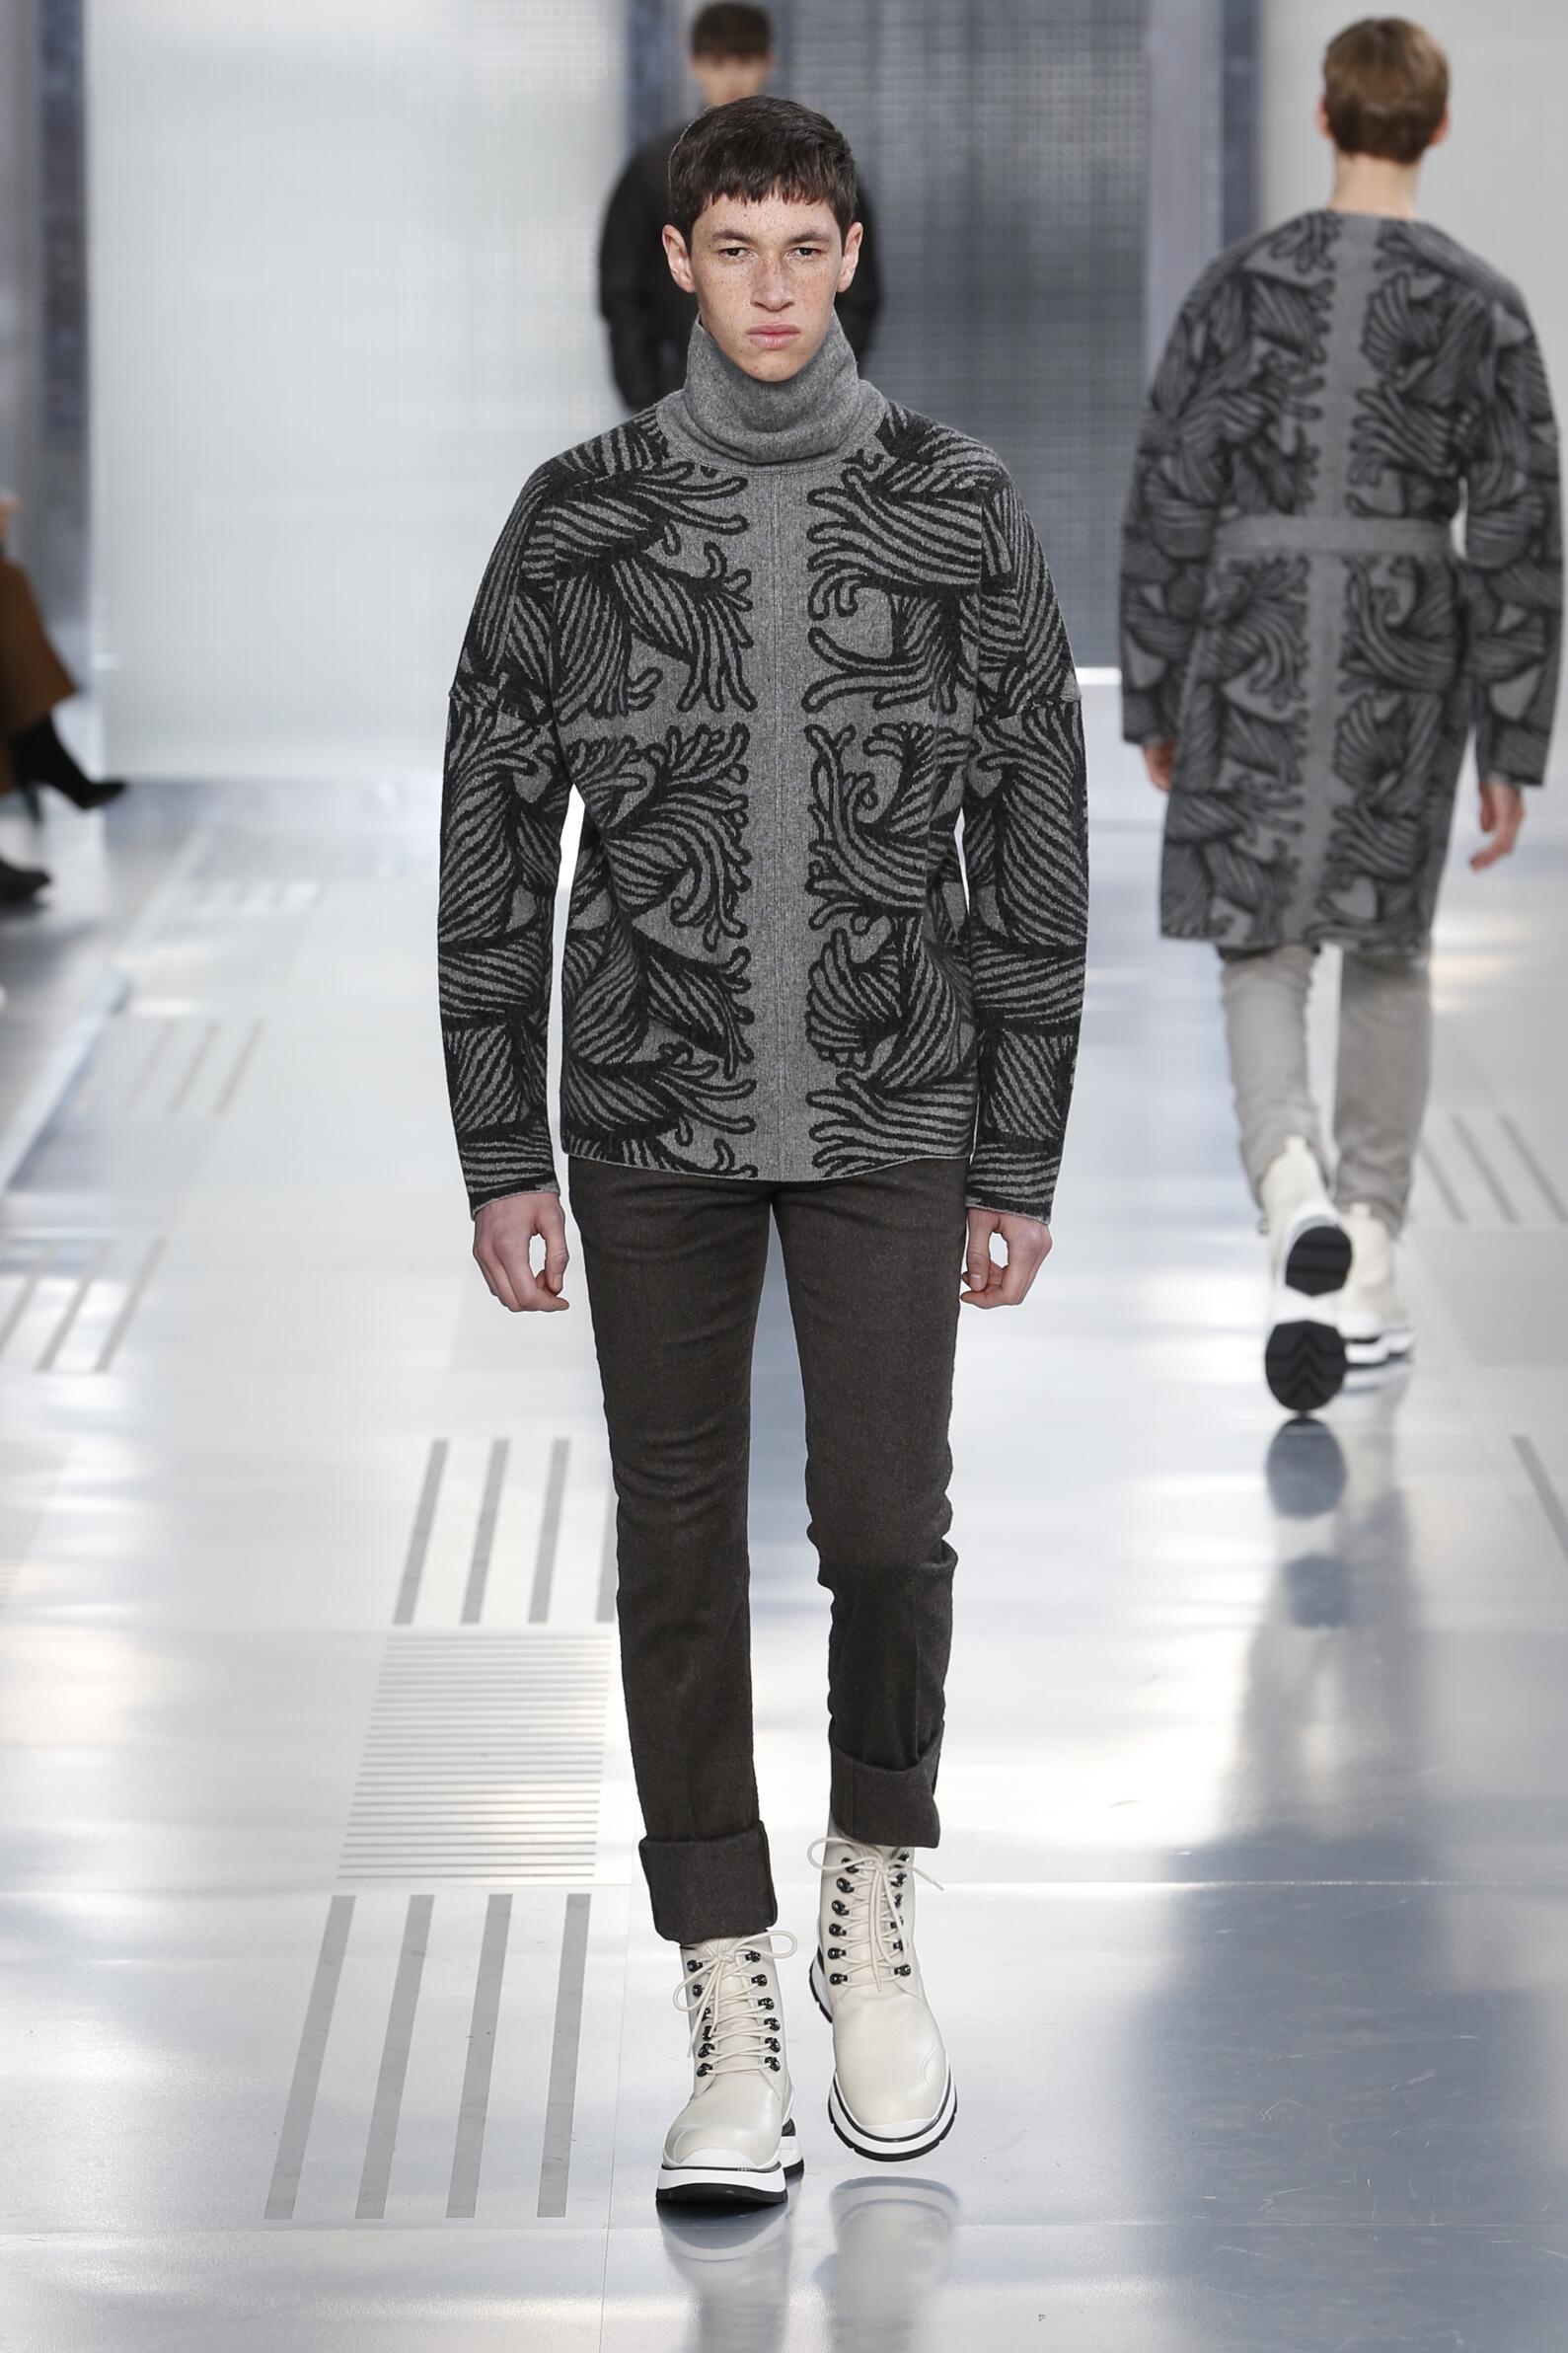 Louis Vuitton Fall Winter 2015 16 Mens Collection Paris Fashion Week